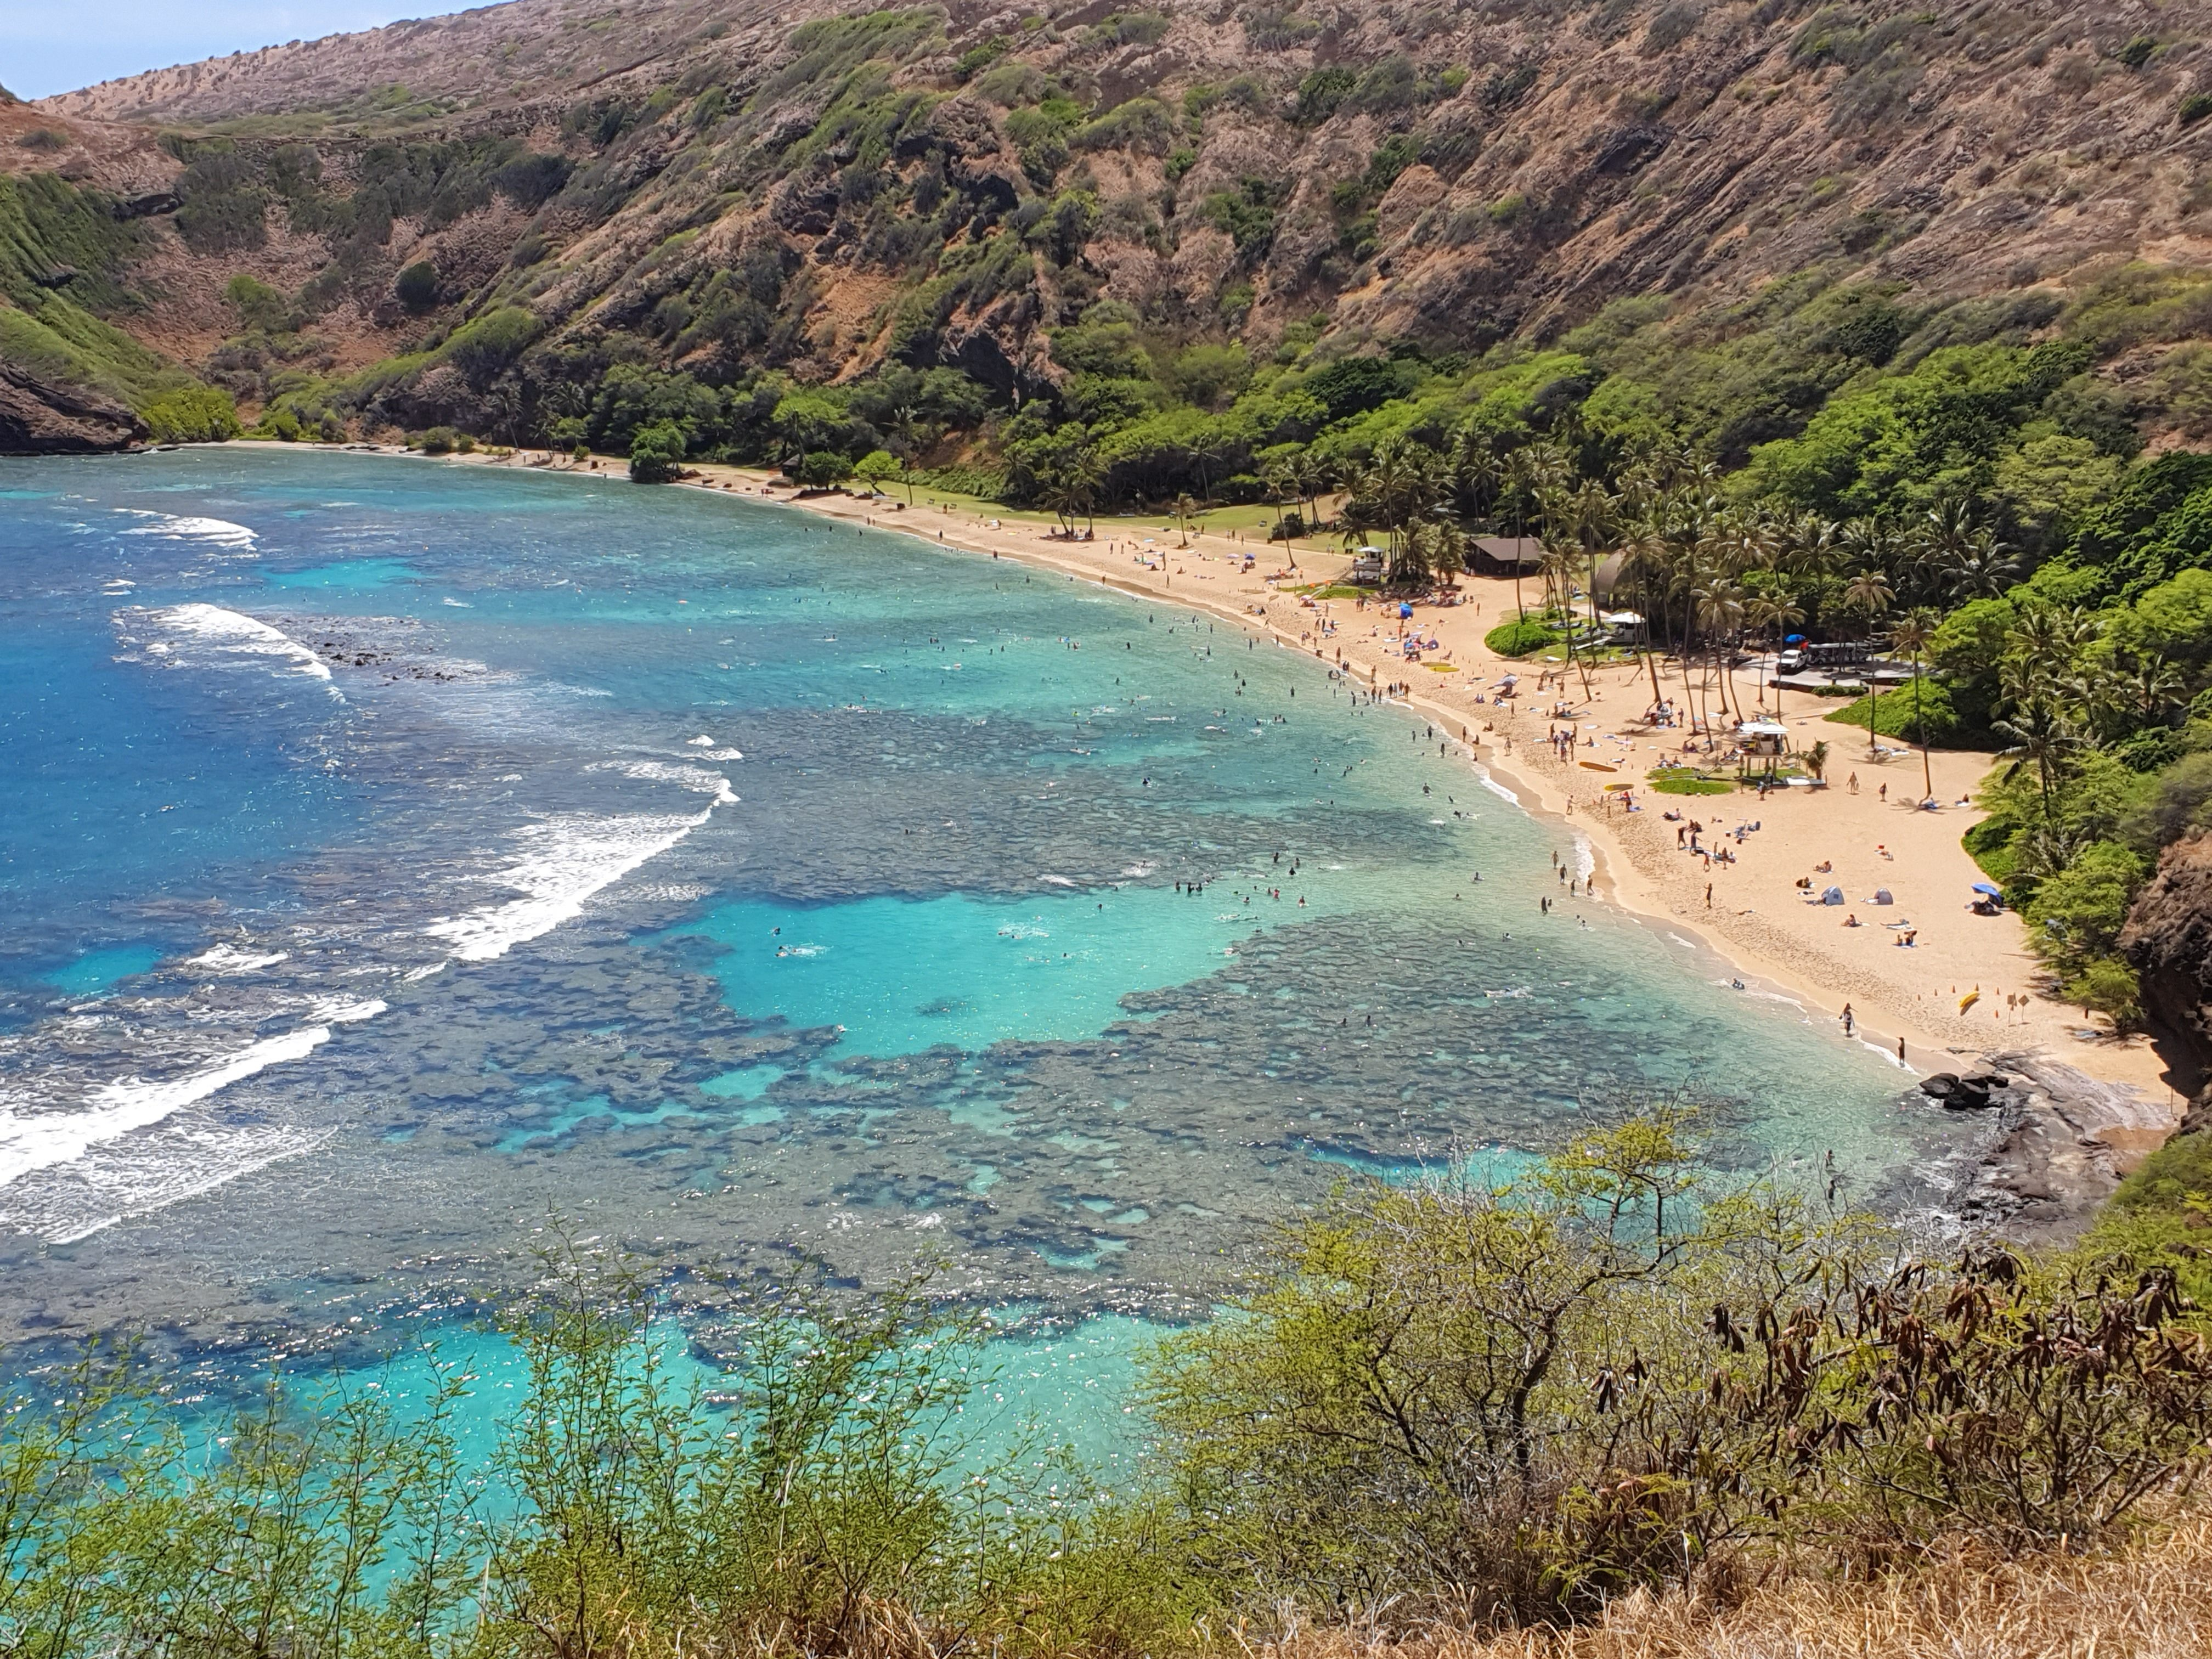 Guide to Visiting Oahu Hawaii - Hanauma Bay